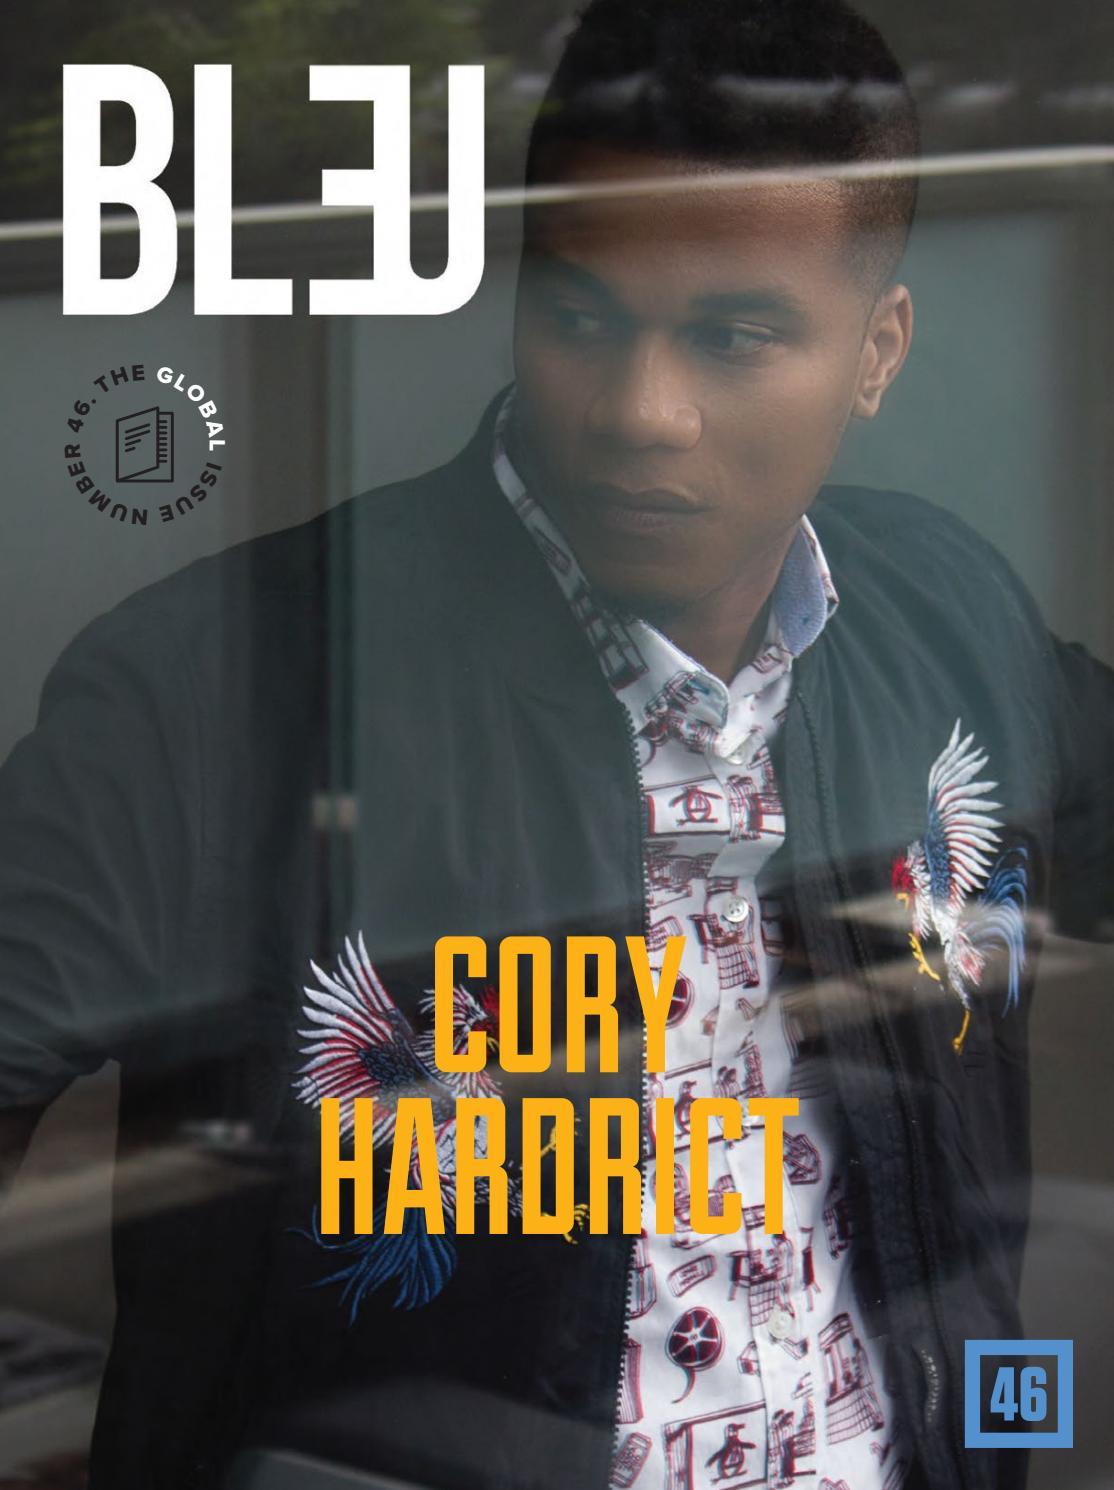 a37717893fc8c Bleu Magazine Issue 46- Cory Hardrict by Bleu Magazine - issuu